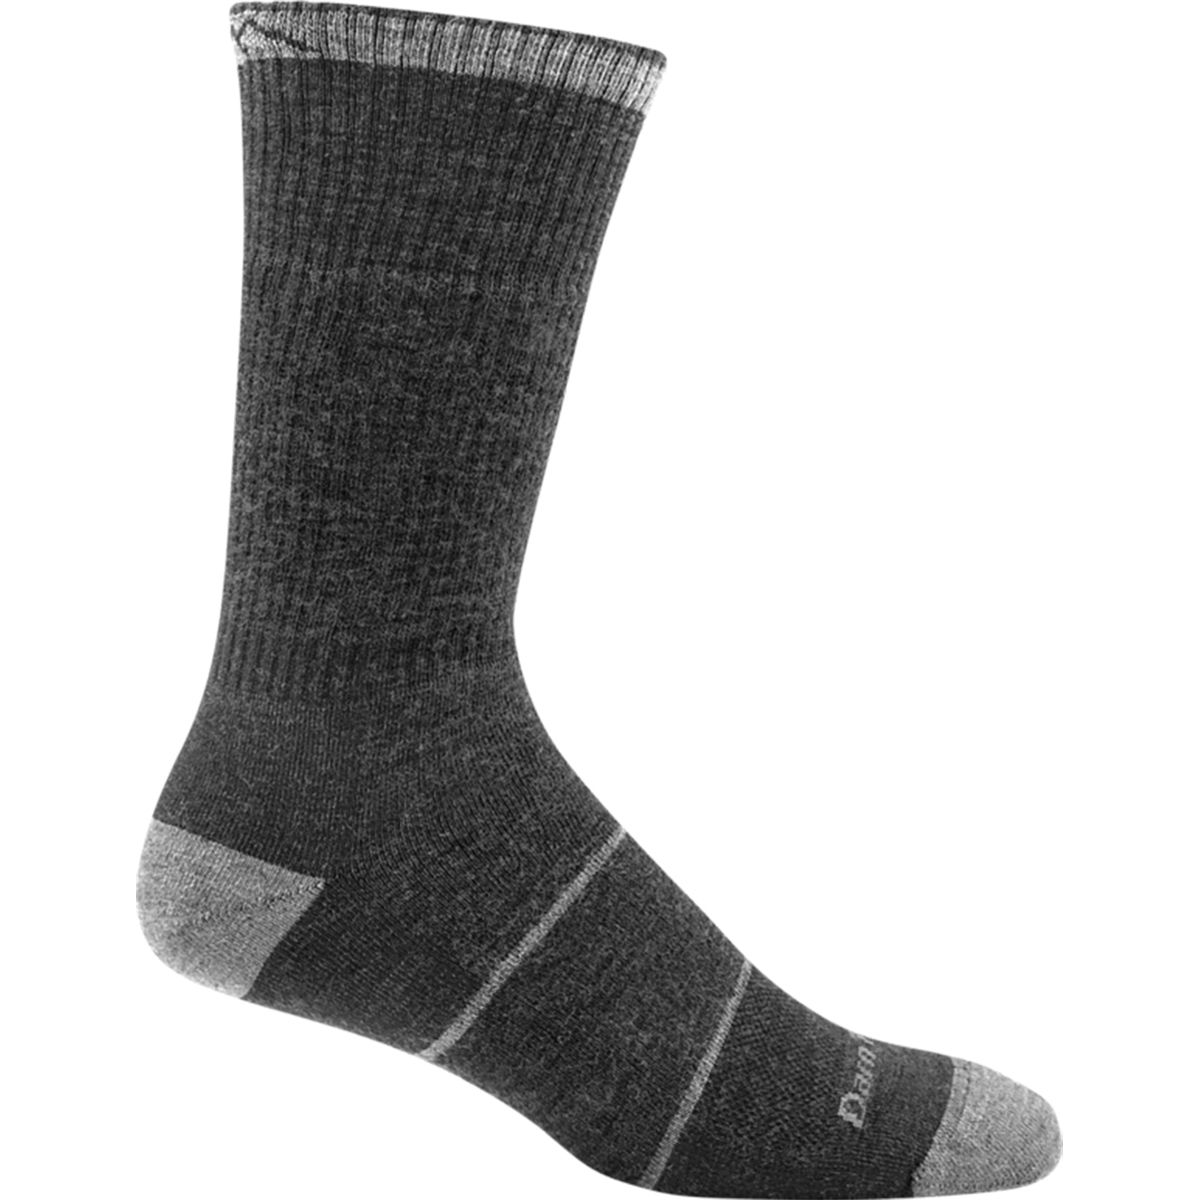 William Jarvis Boot Full Cushion Sock - Men